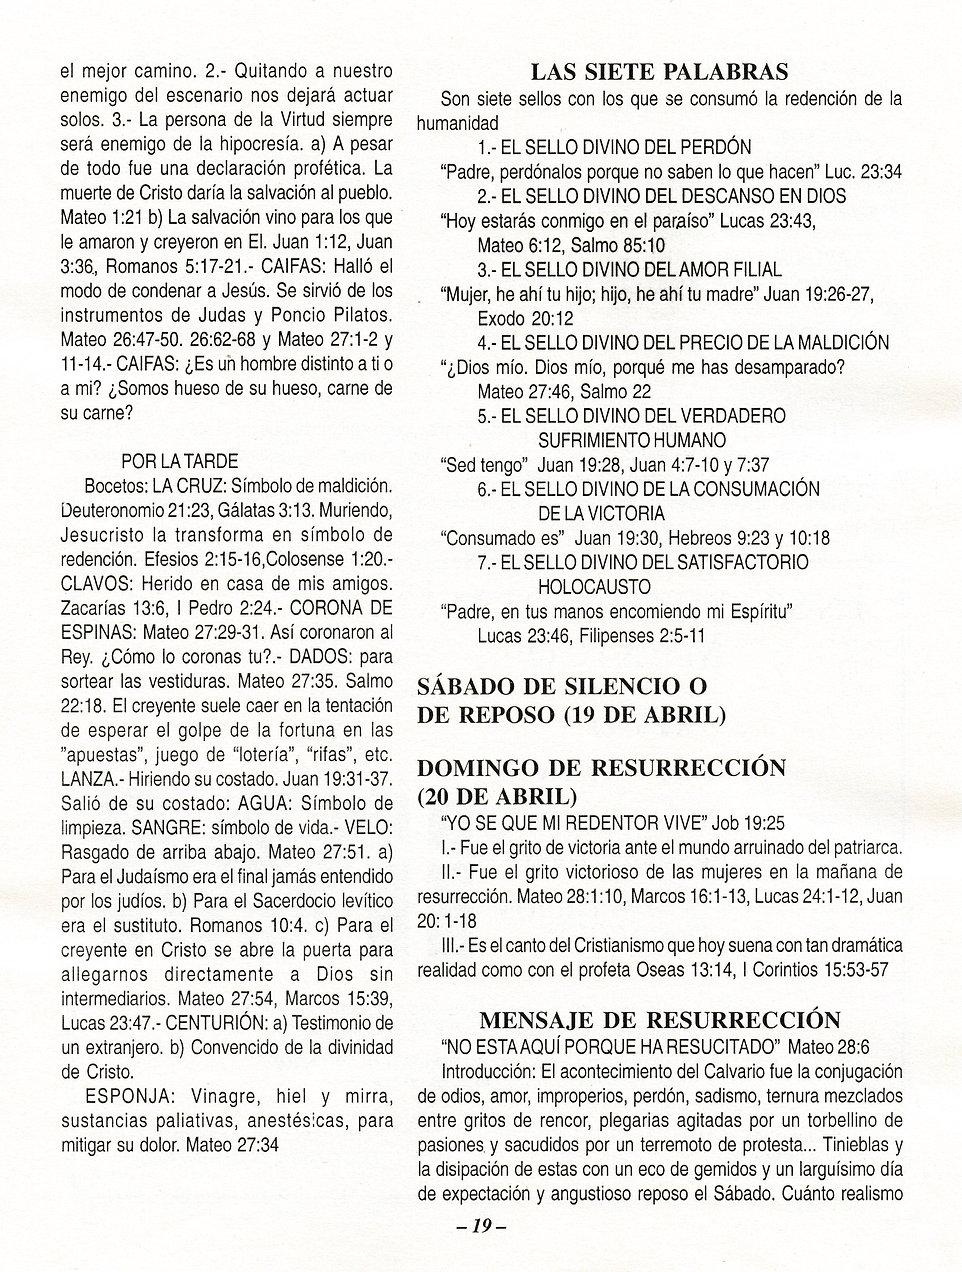 2003 eem edit (3).jpg